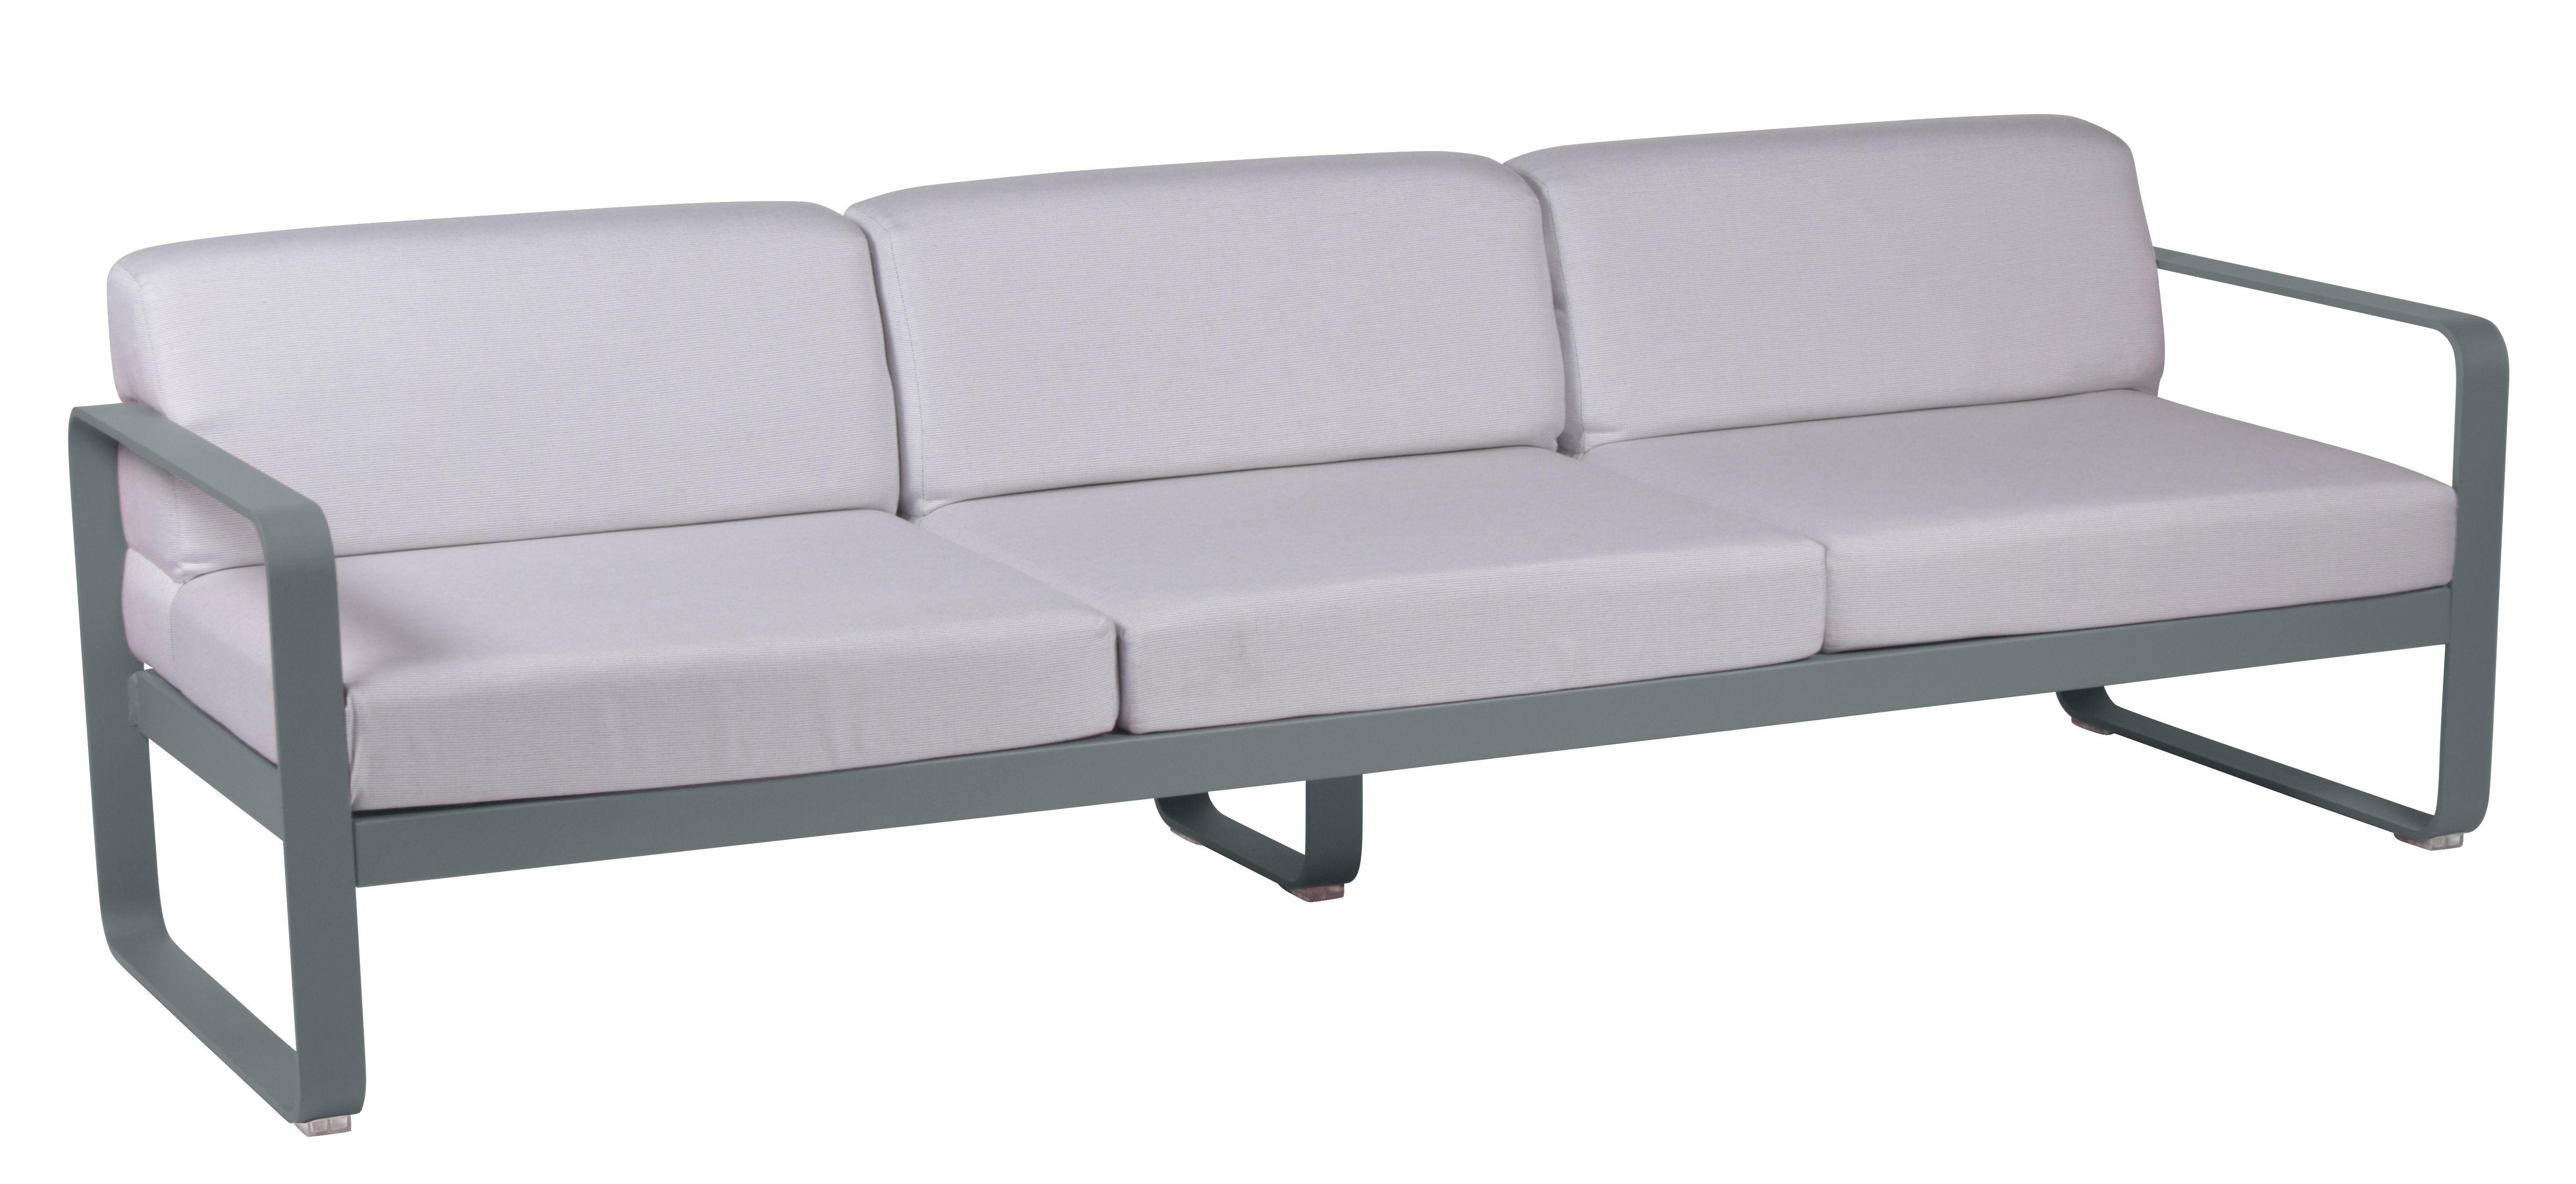 Furniture - Sofas - Bellevie Straight sofa - 3 seats / L 235 cm – Grey-white fabric by Fermob - Storm grey / White fabric - Acrylic fabric, Foam, Lacquered aluminium